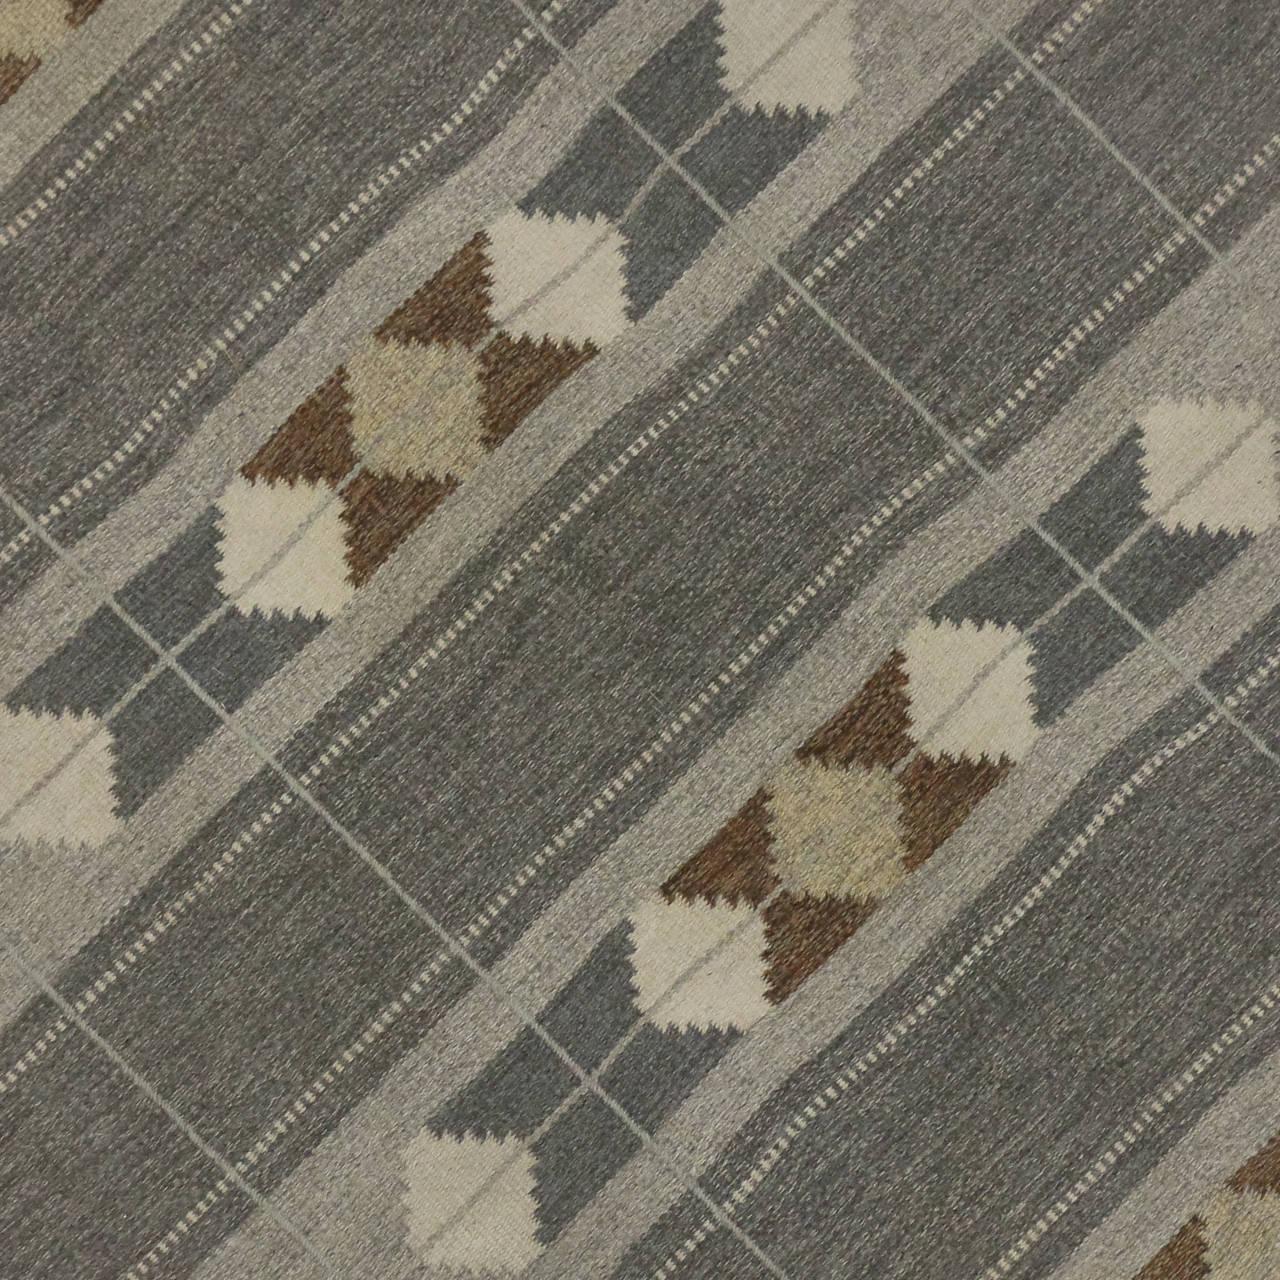 Modern Scandinavian Rug: Vintage Swedish Rollakan Gray Flatweave Kilim Rug With